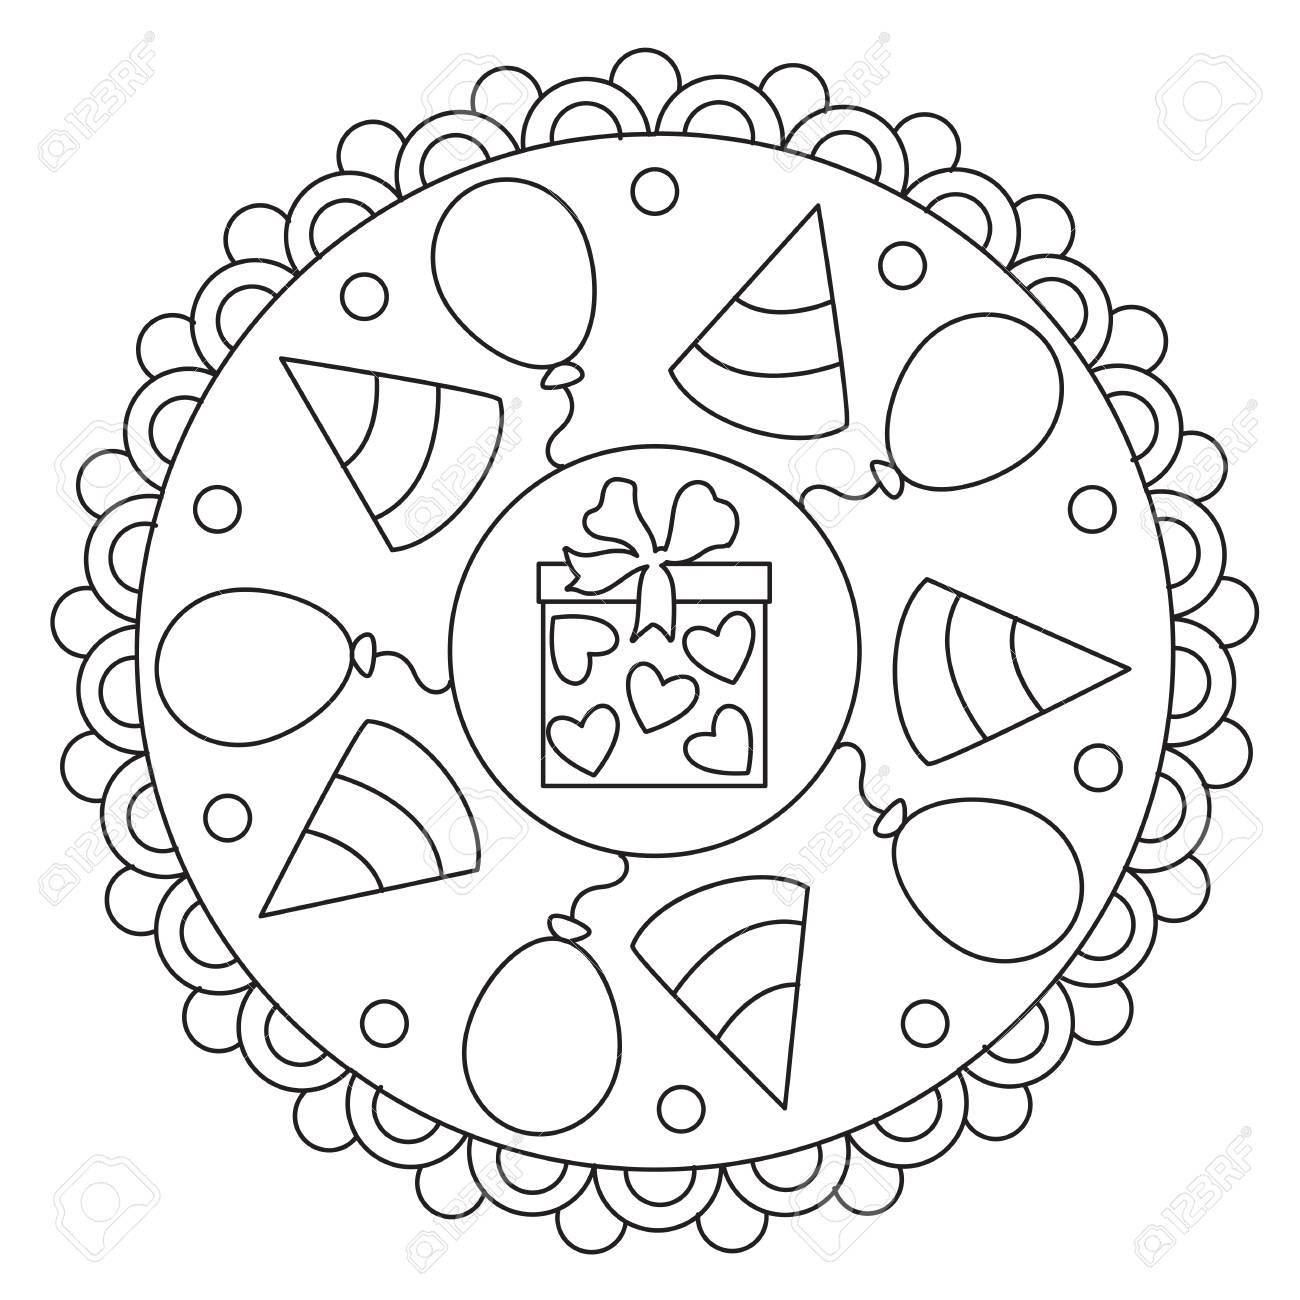 Vector coloring simple mandala round ornament of celebration